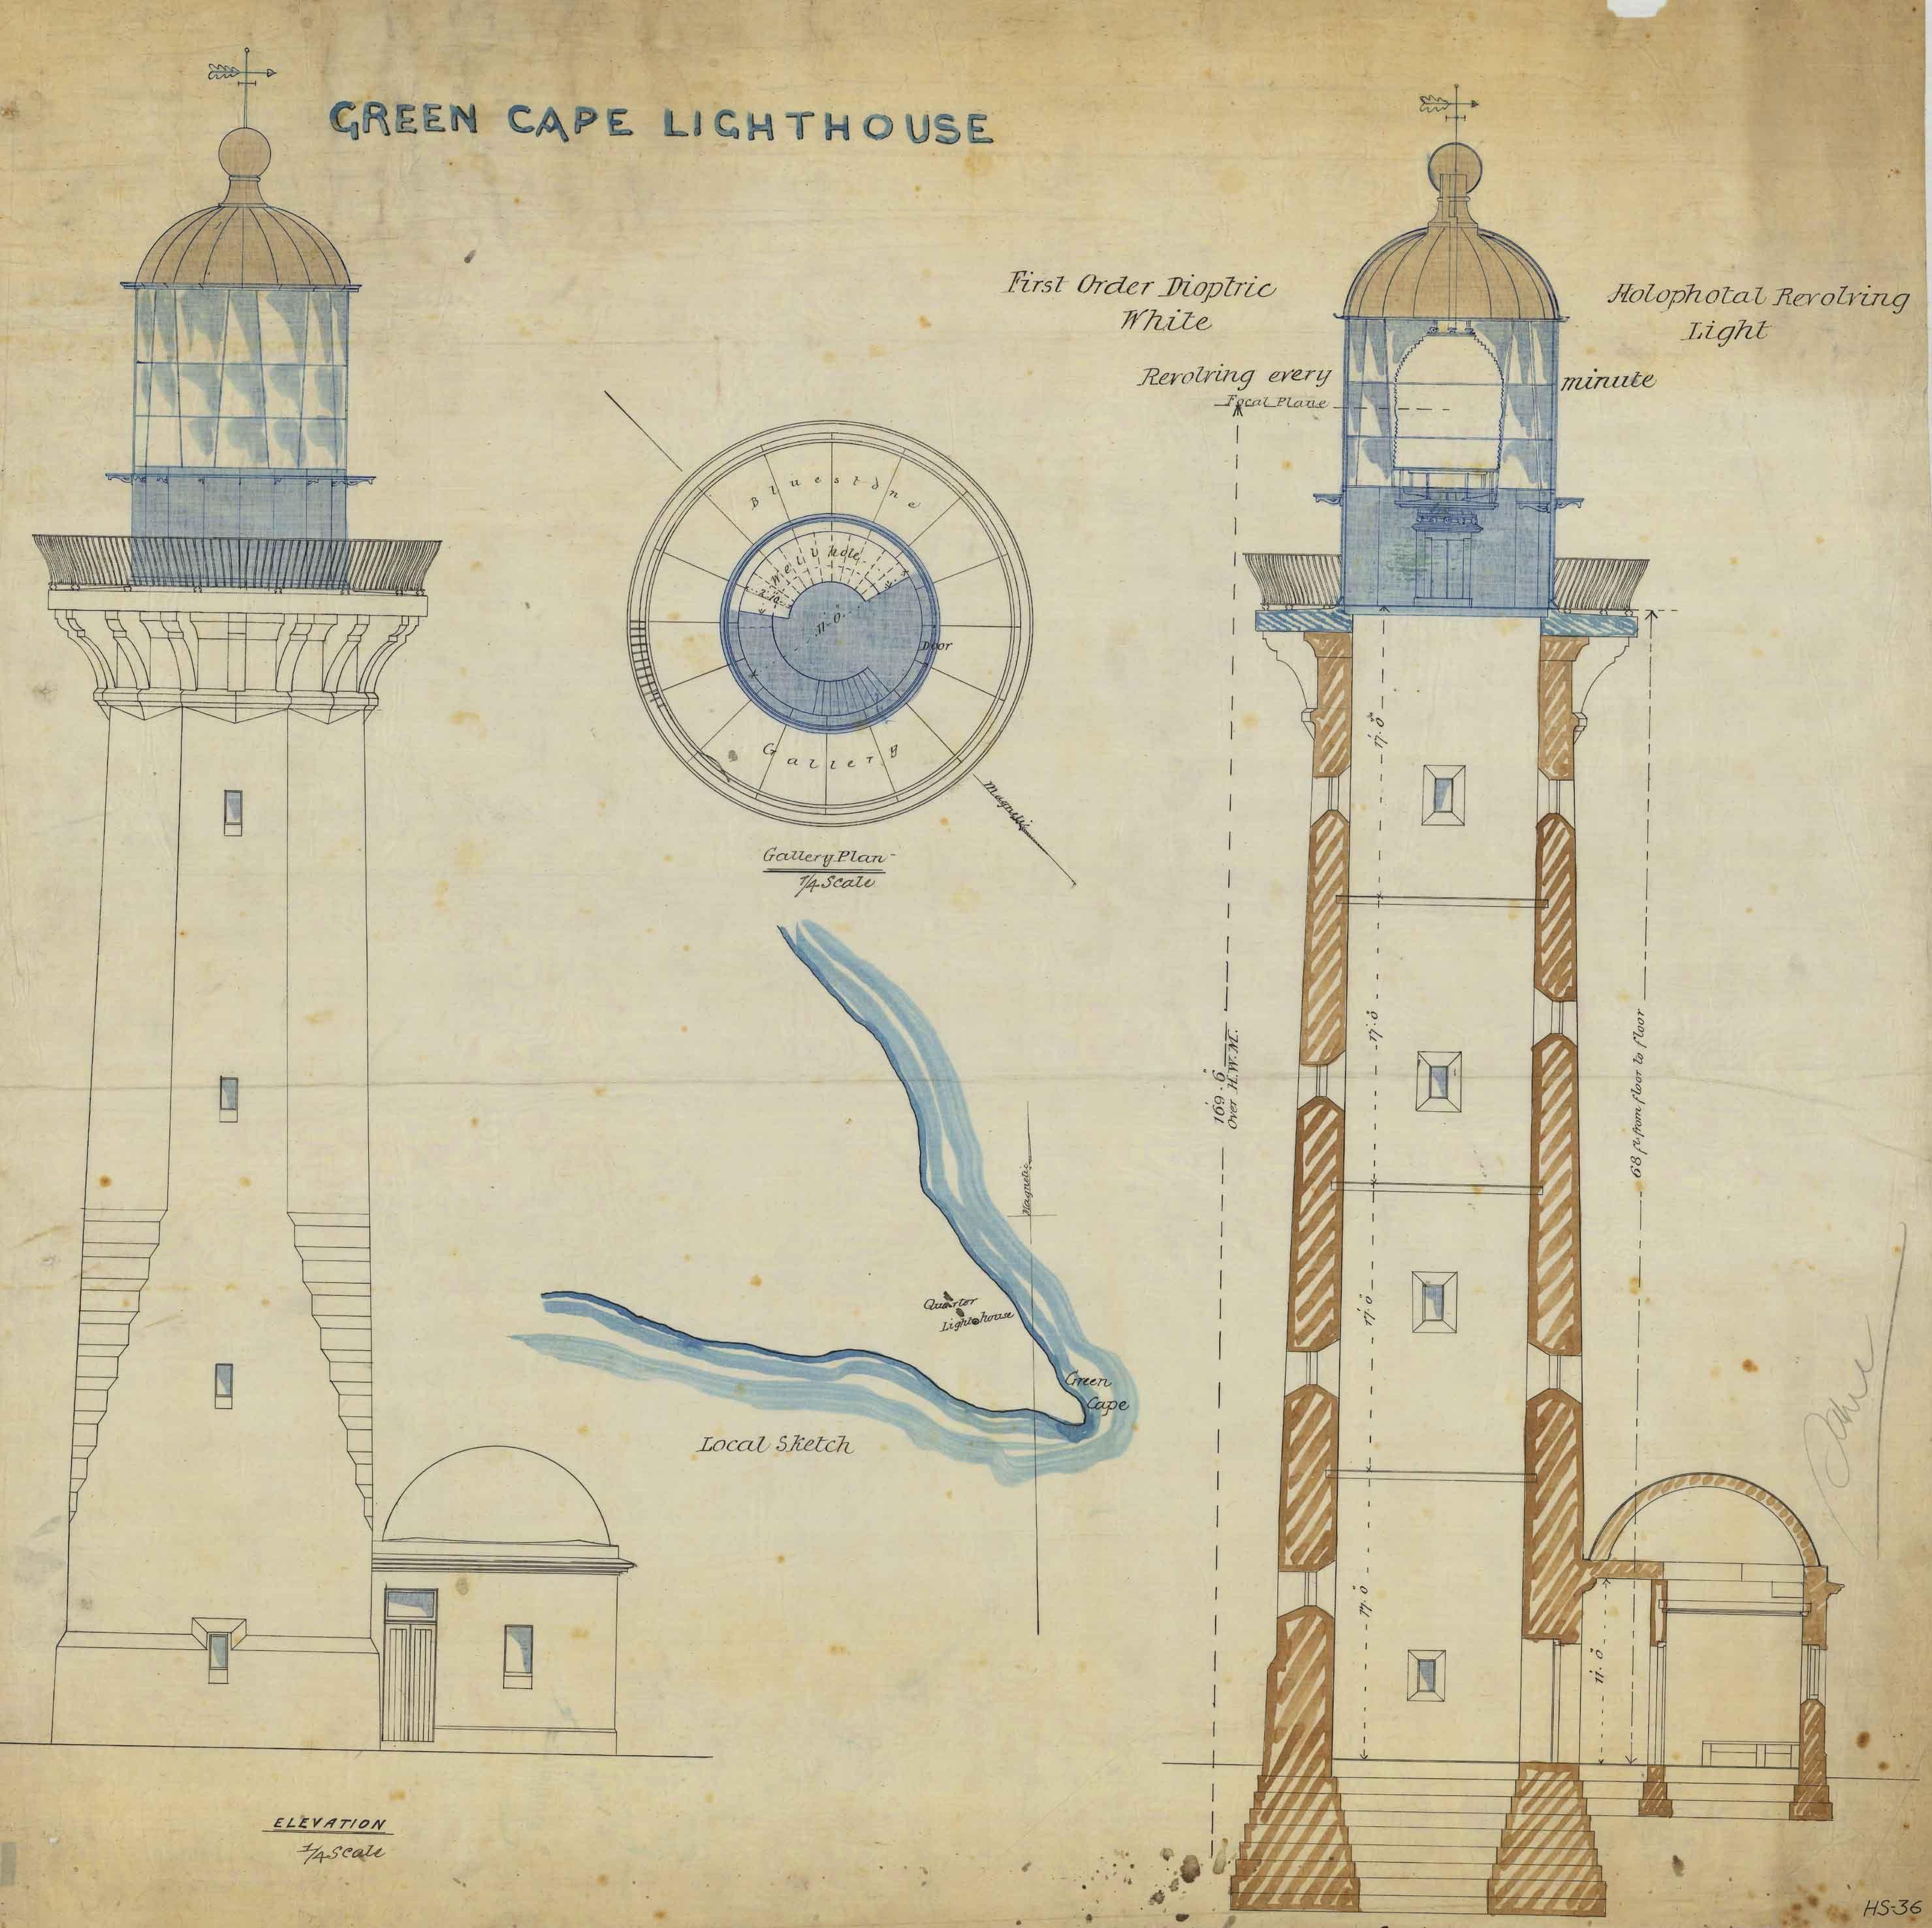 Green_Cape_Lighthouse,_plans,_1915.jpg (2959×2953)